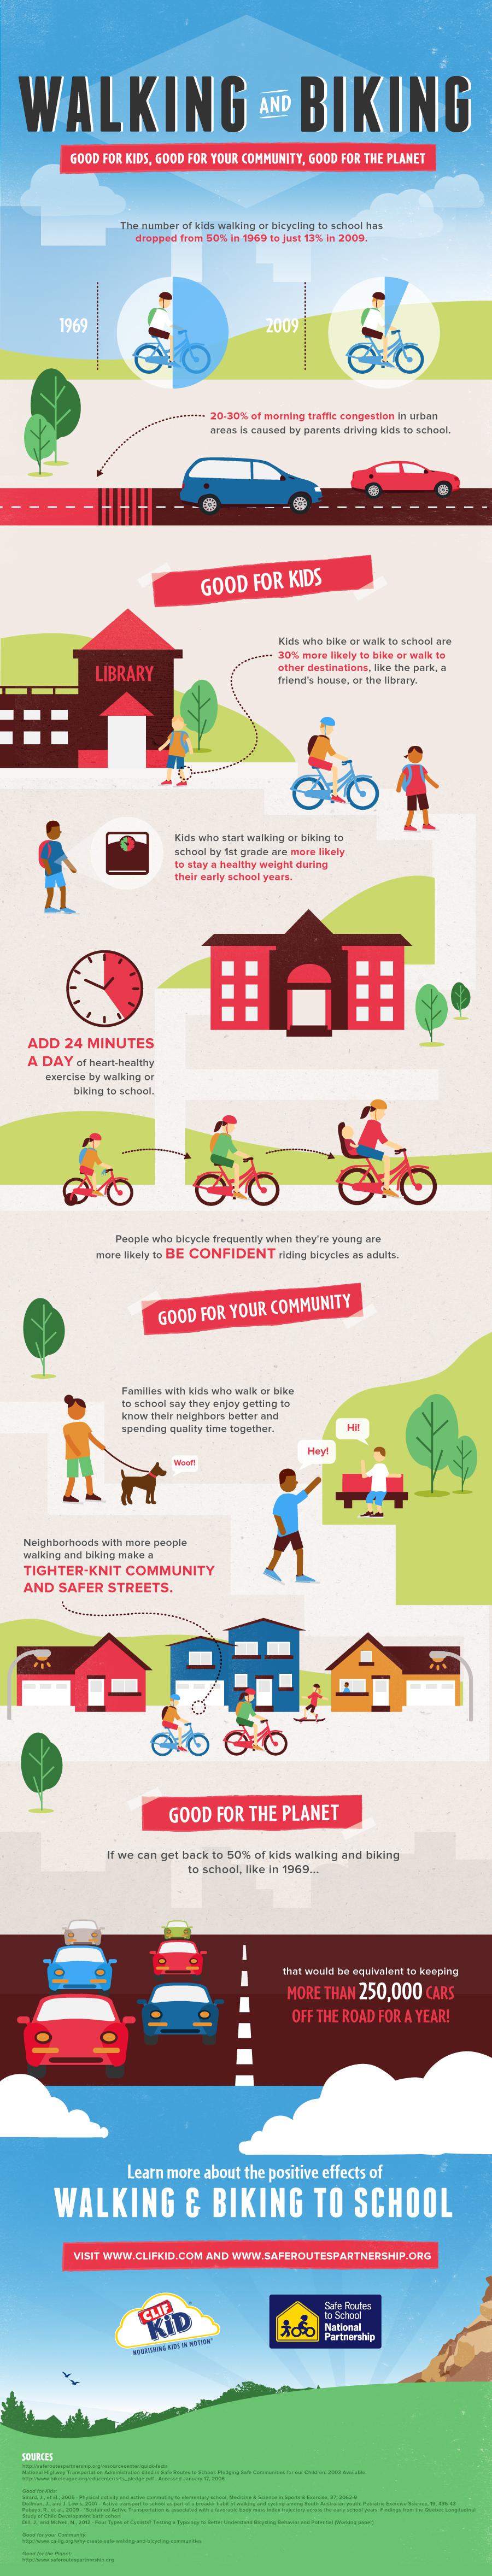 Walking And Biking To School